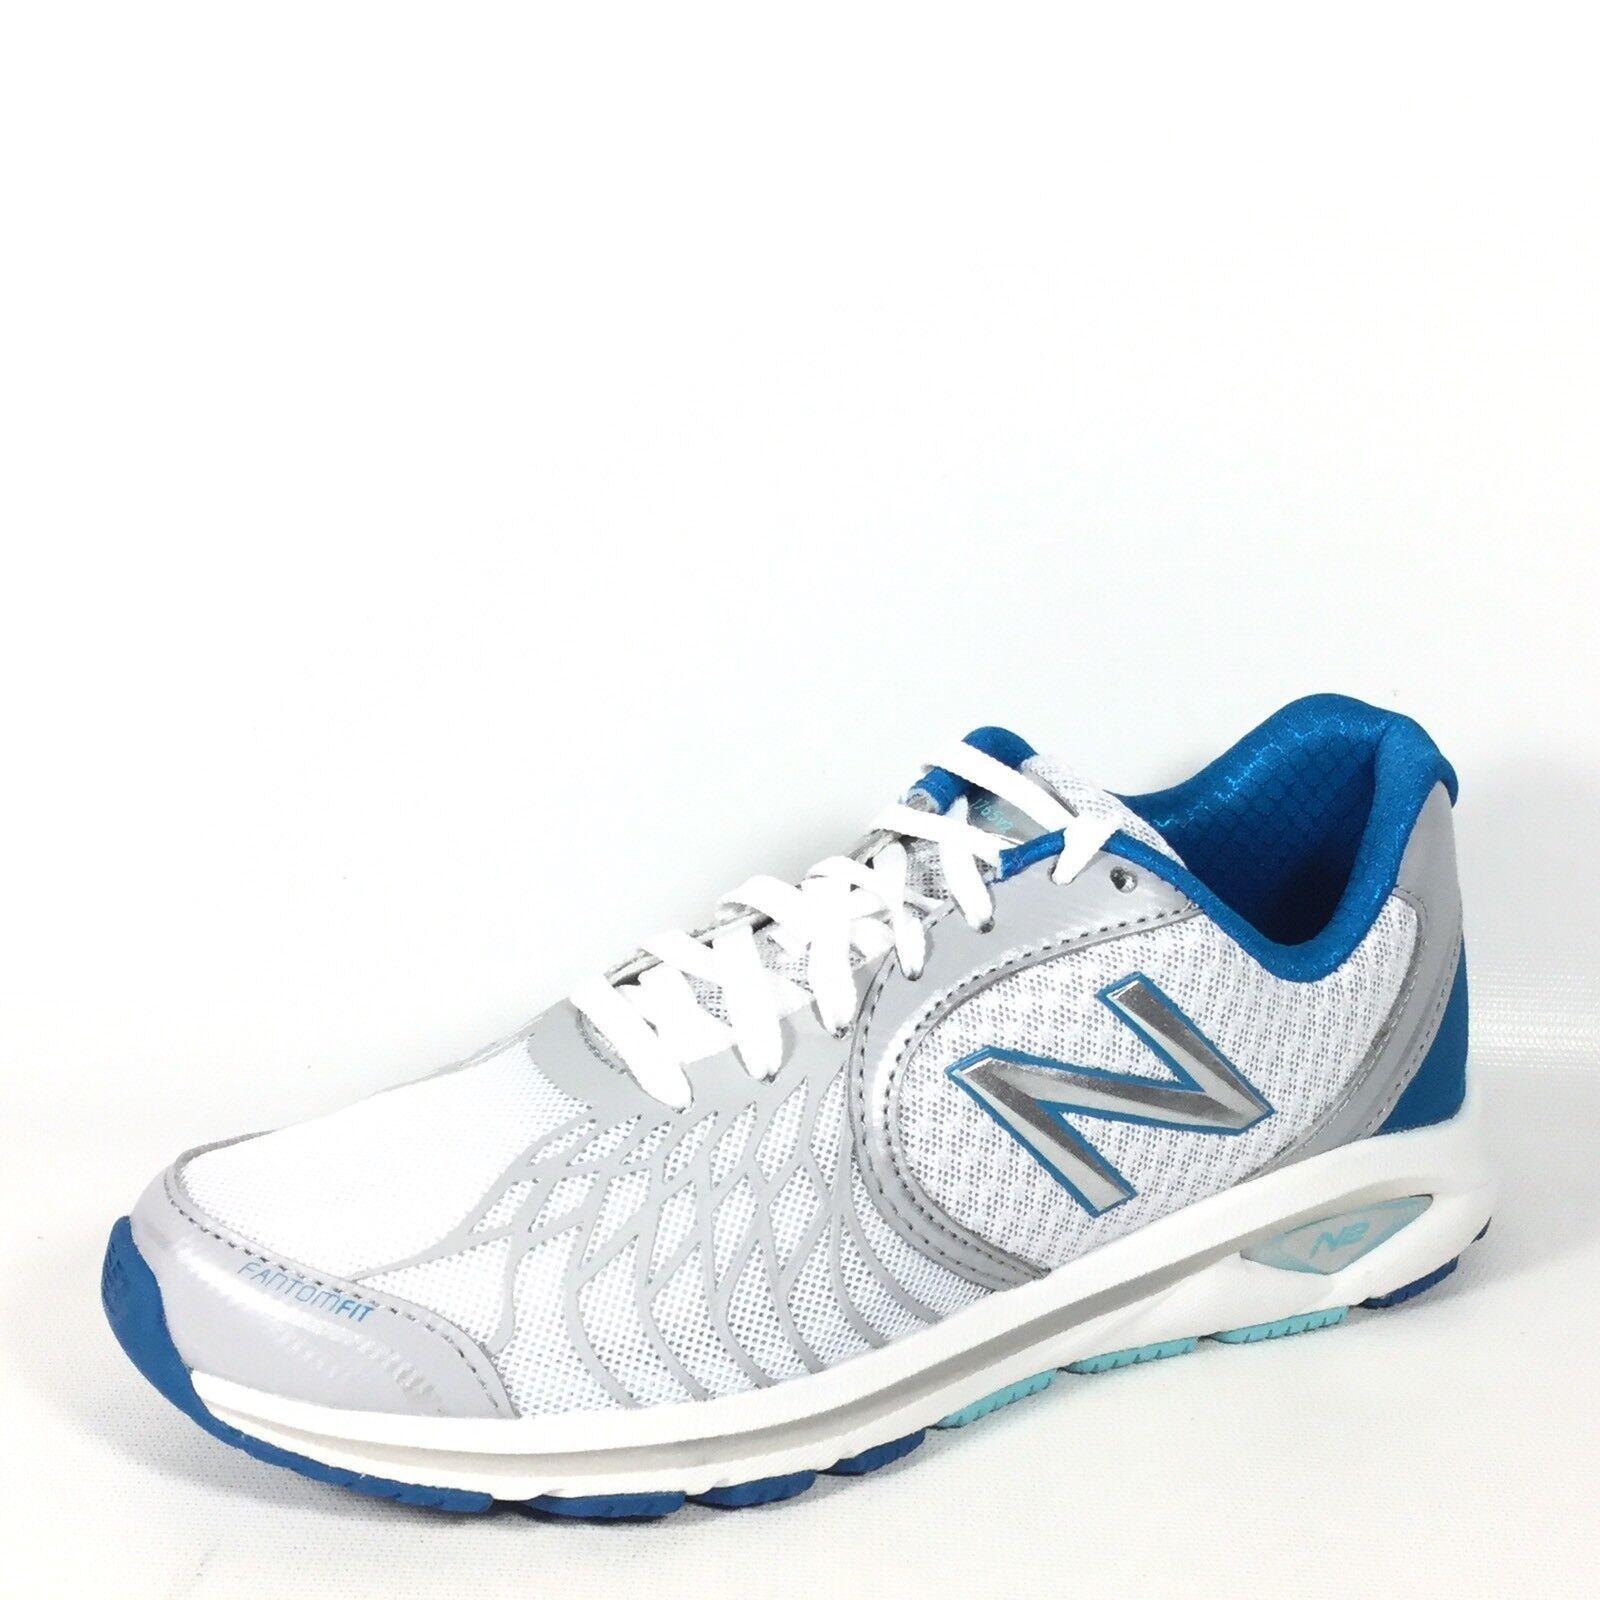 New Balance WW1765KO Womens Size 5.5 B White/Grey/Blue Walking Sneakers.